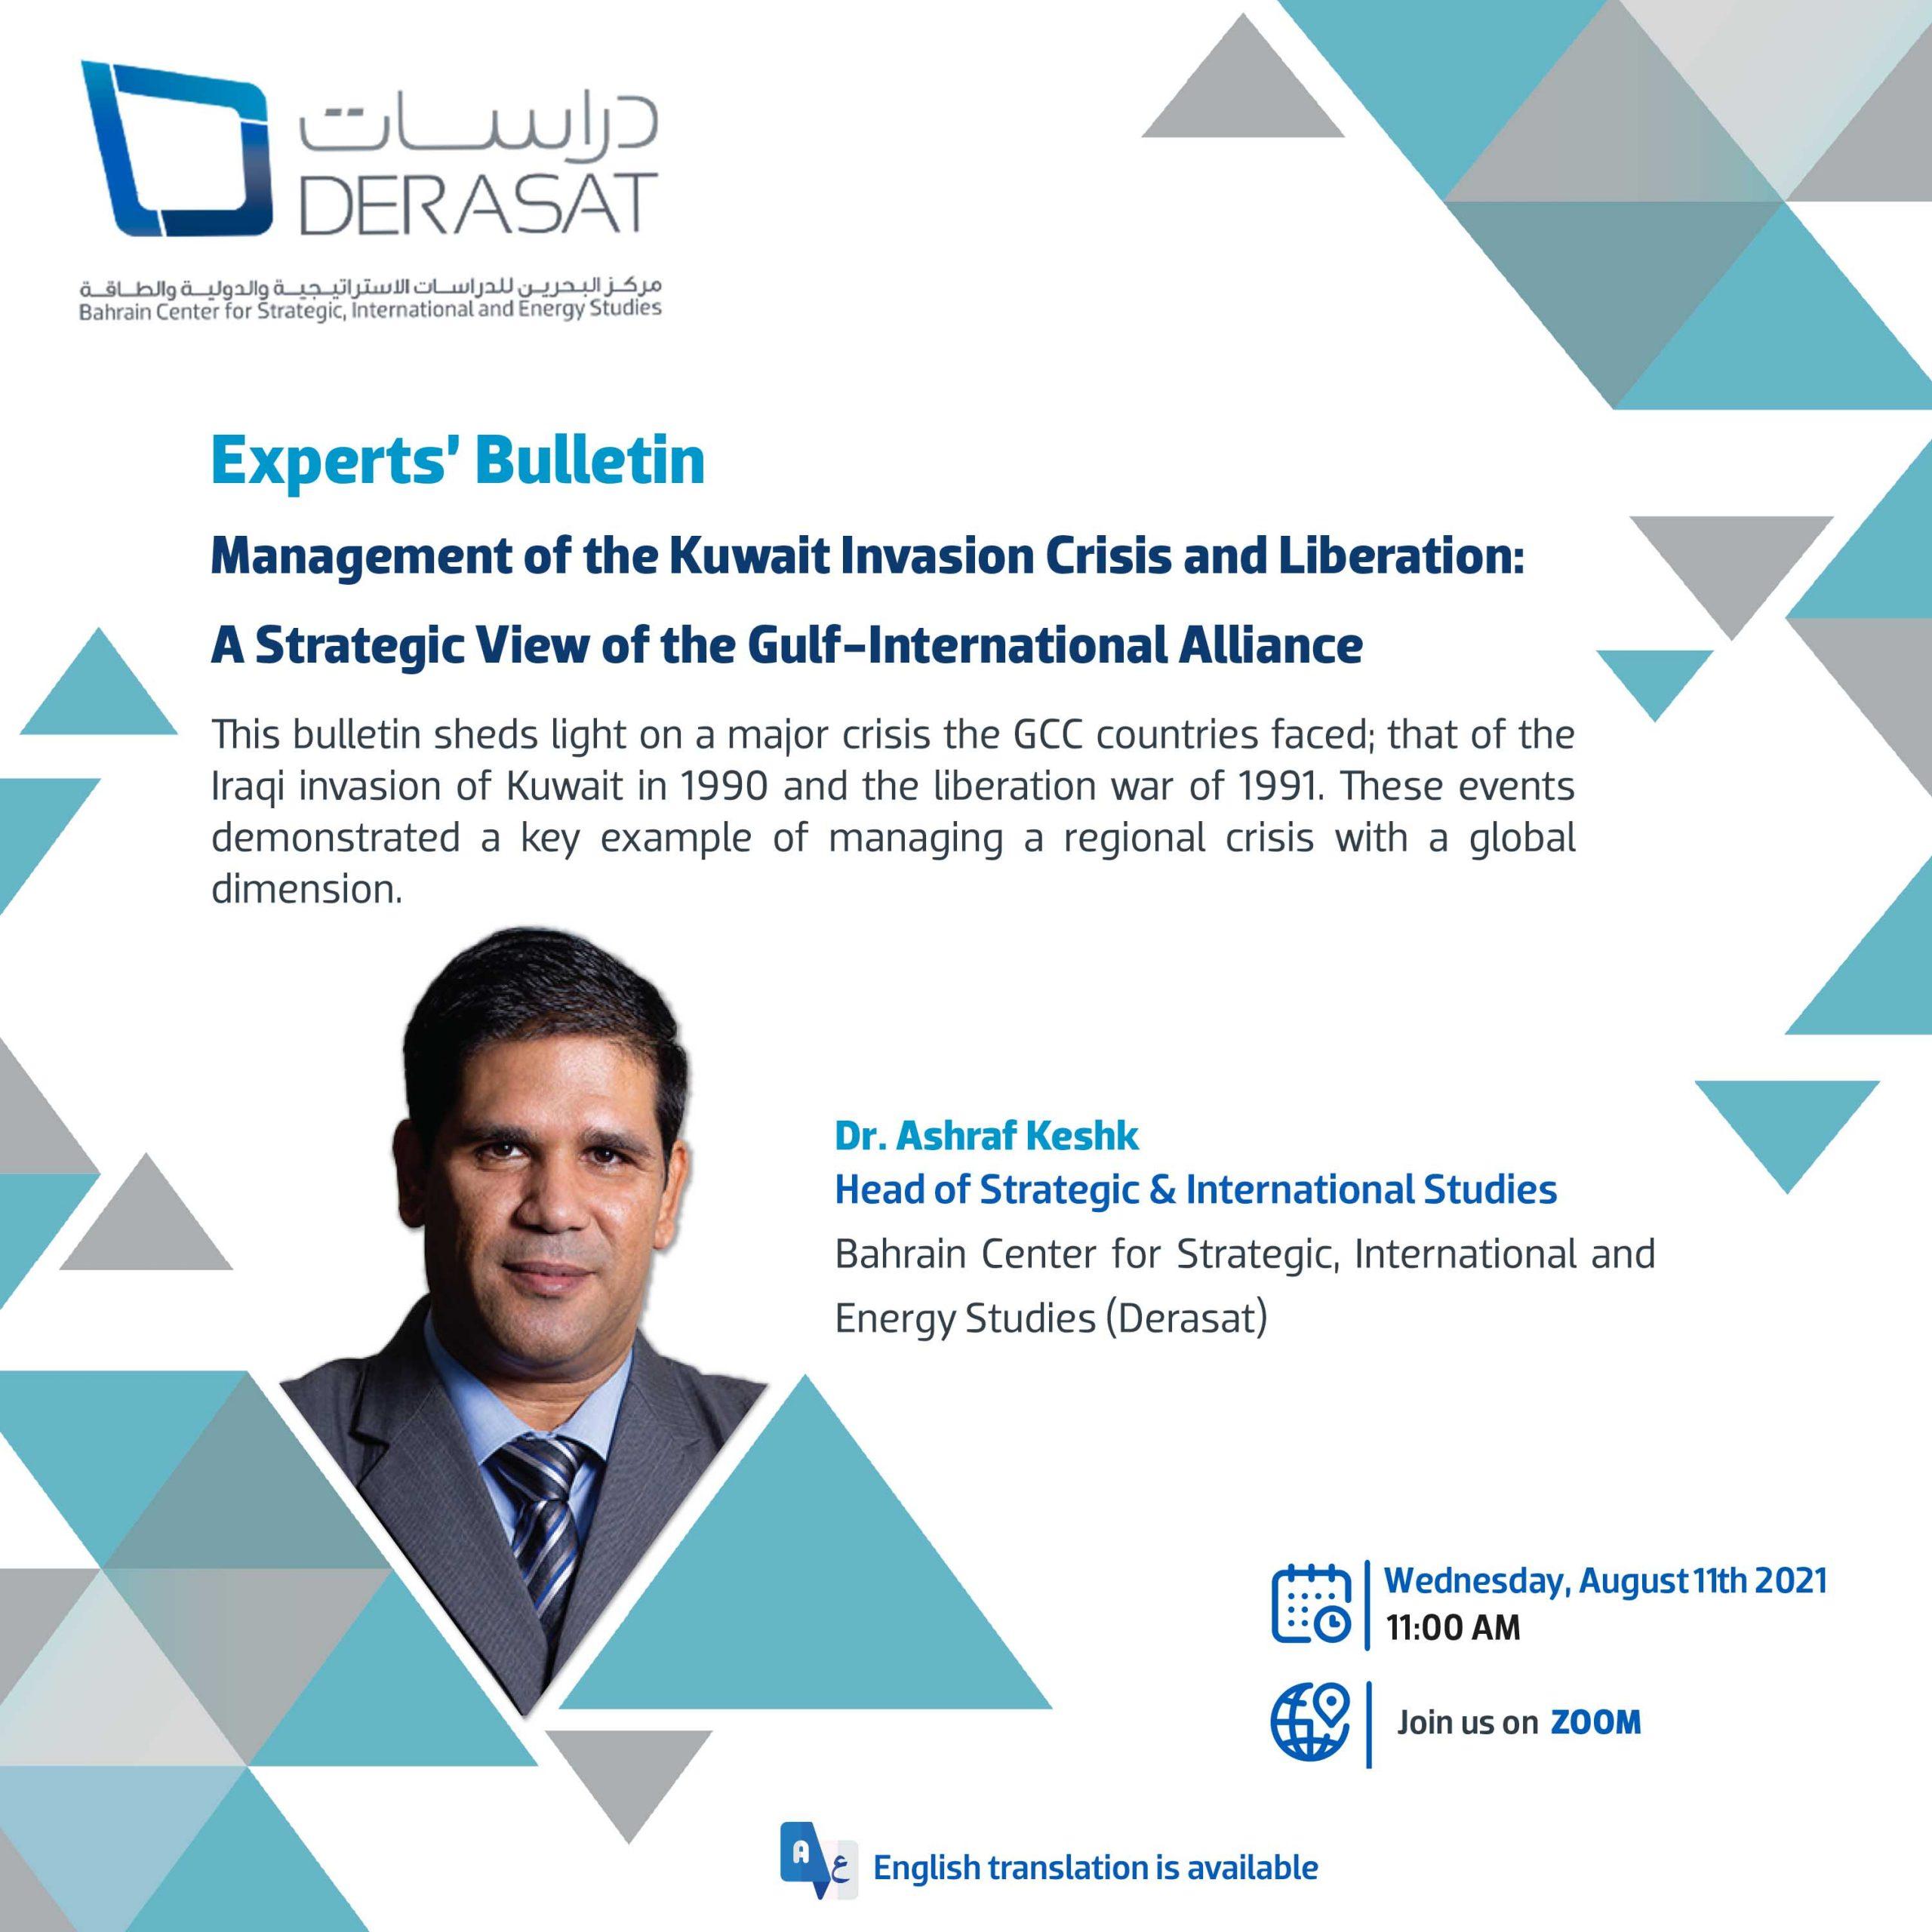 Expert Bulletin: Arabian Gulf States' Management of the Kuwait Invasion Crisis and Liberation: A Strategic View of the Gulf-International Alliance